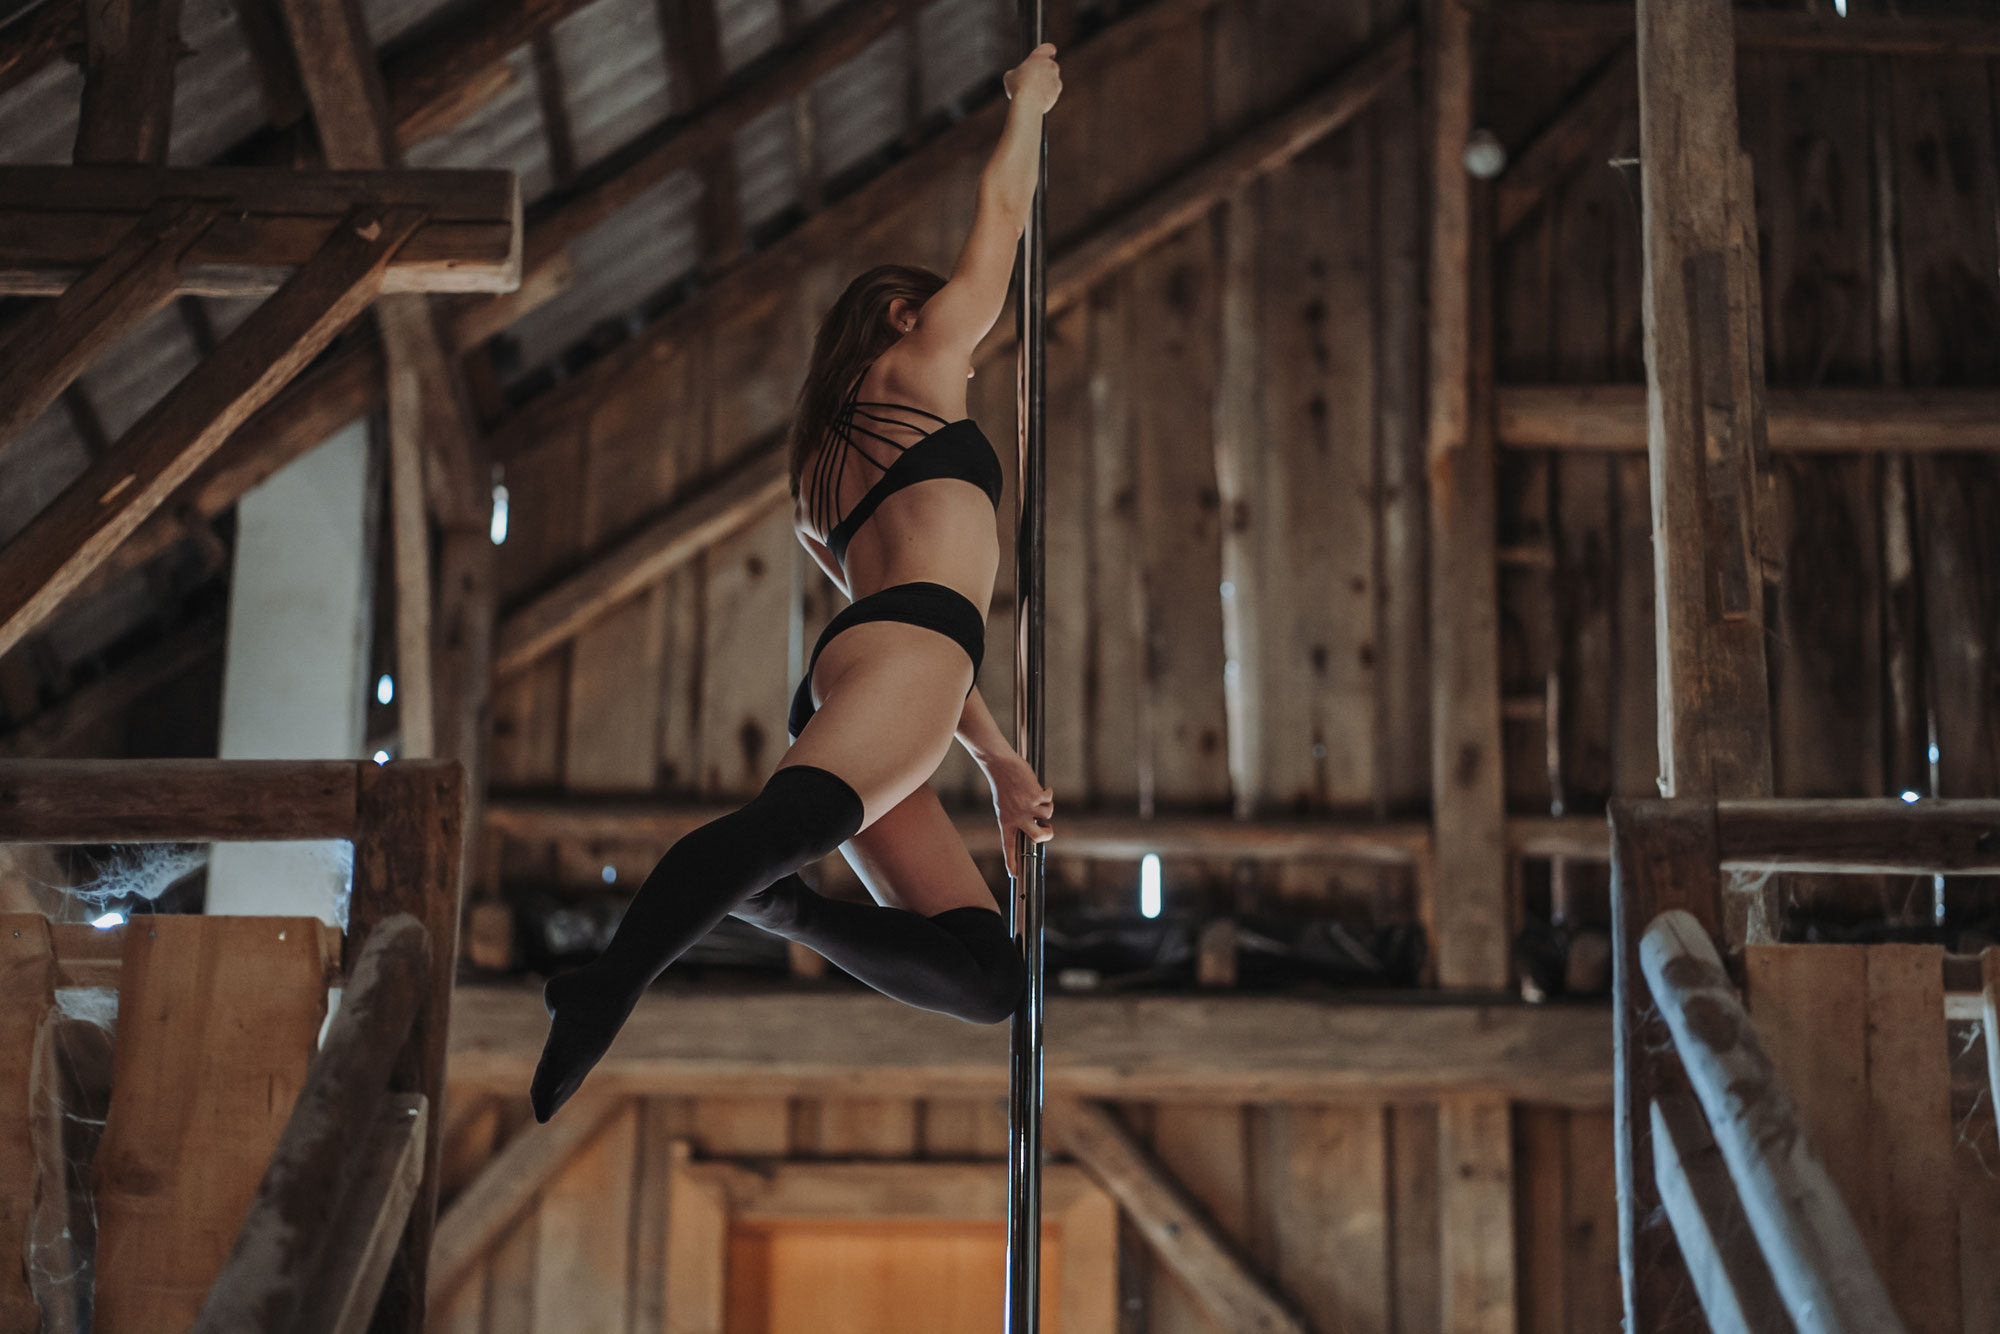 Blog #005 - Let's Pole!